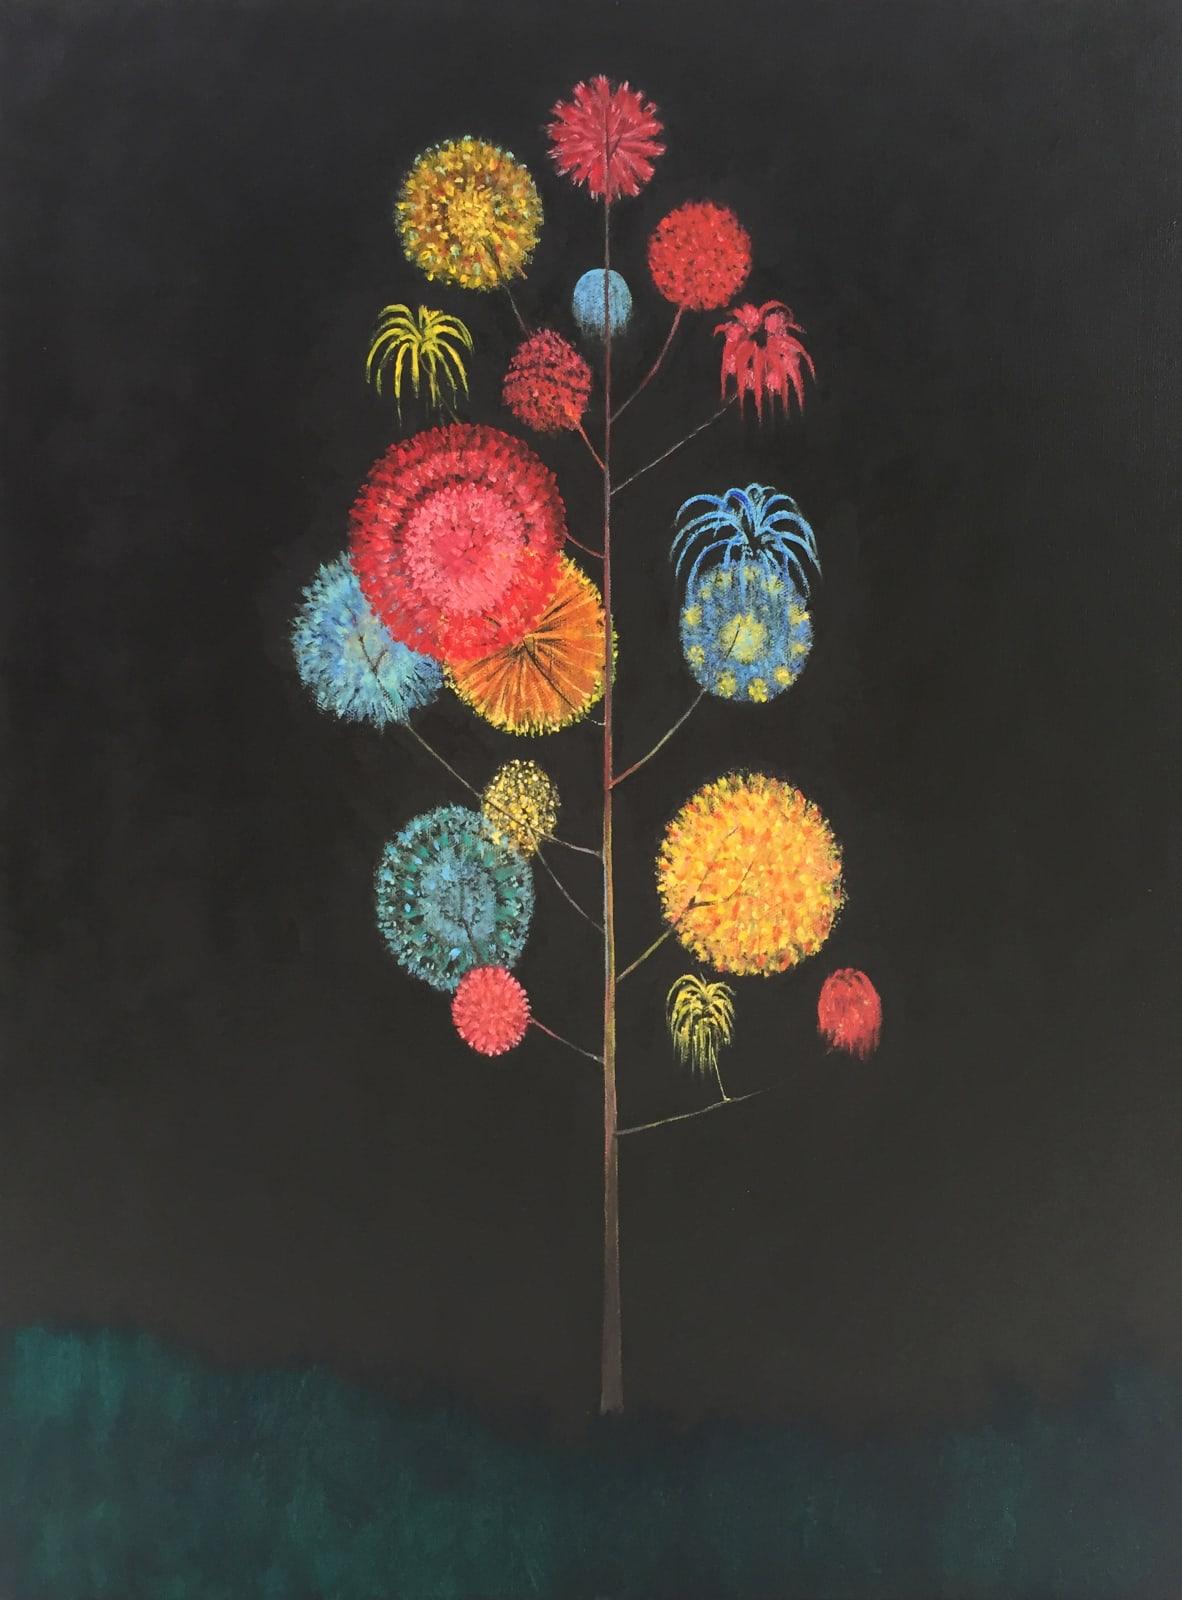 Ari Lankin, Tree V, 2019